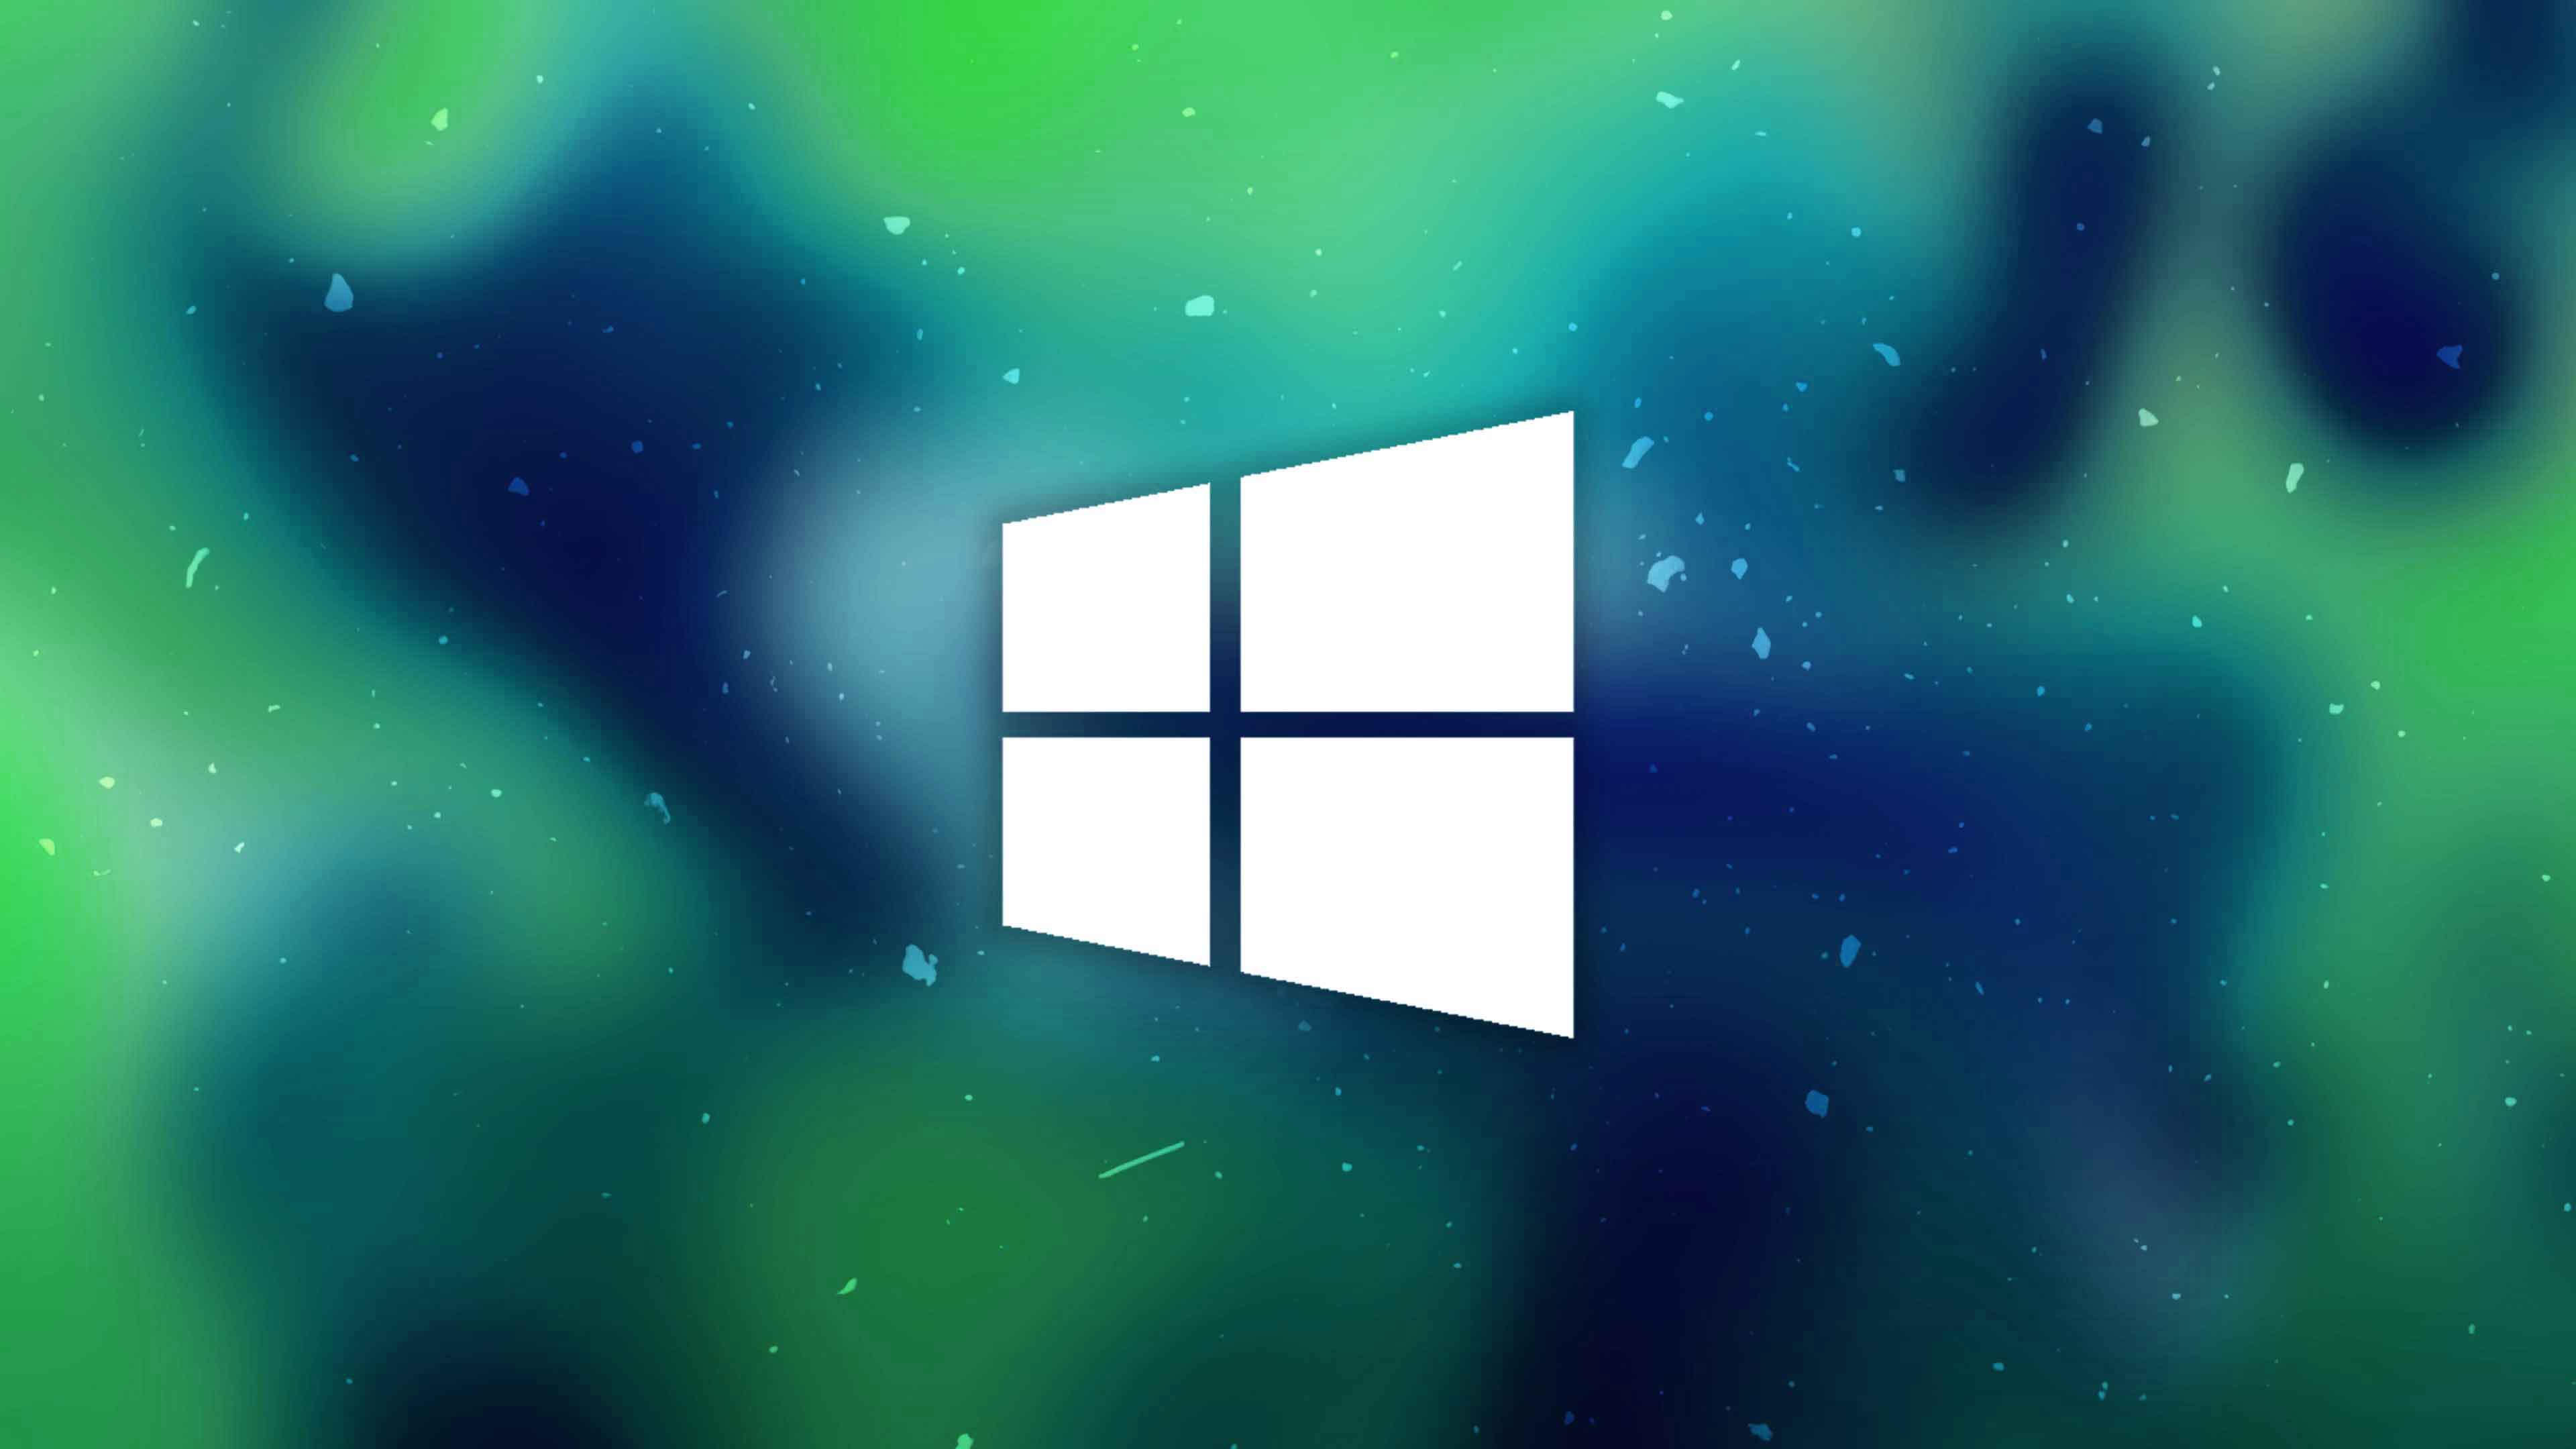 Windows 10 Wallpaper 4k Posted By Samantha Peltier